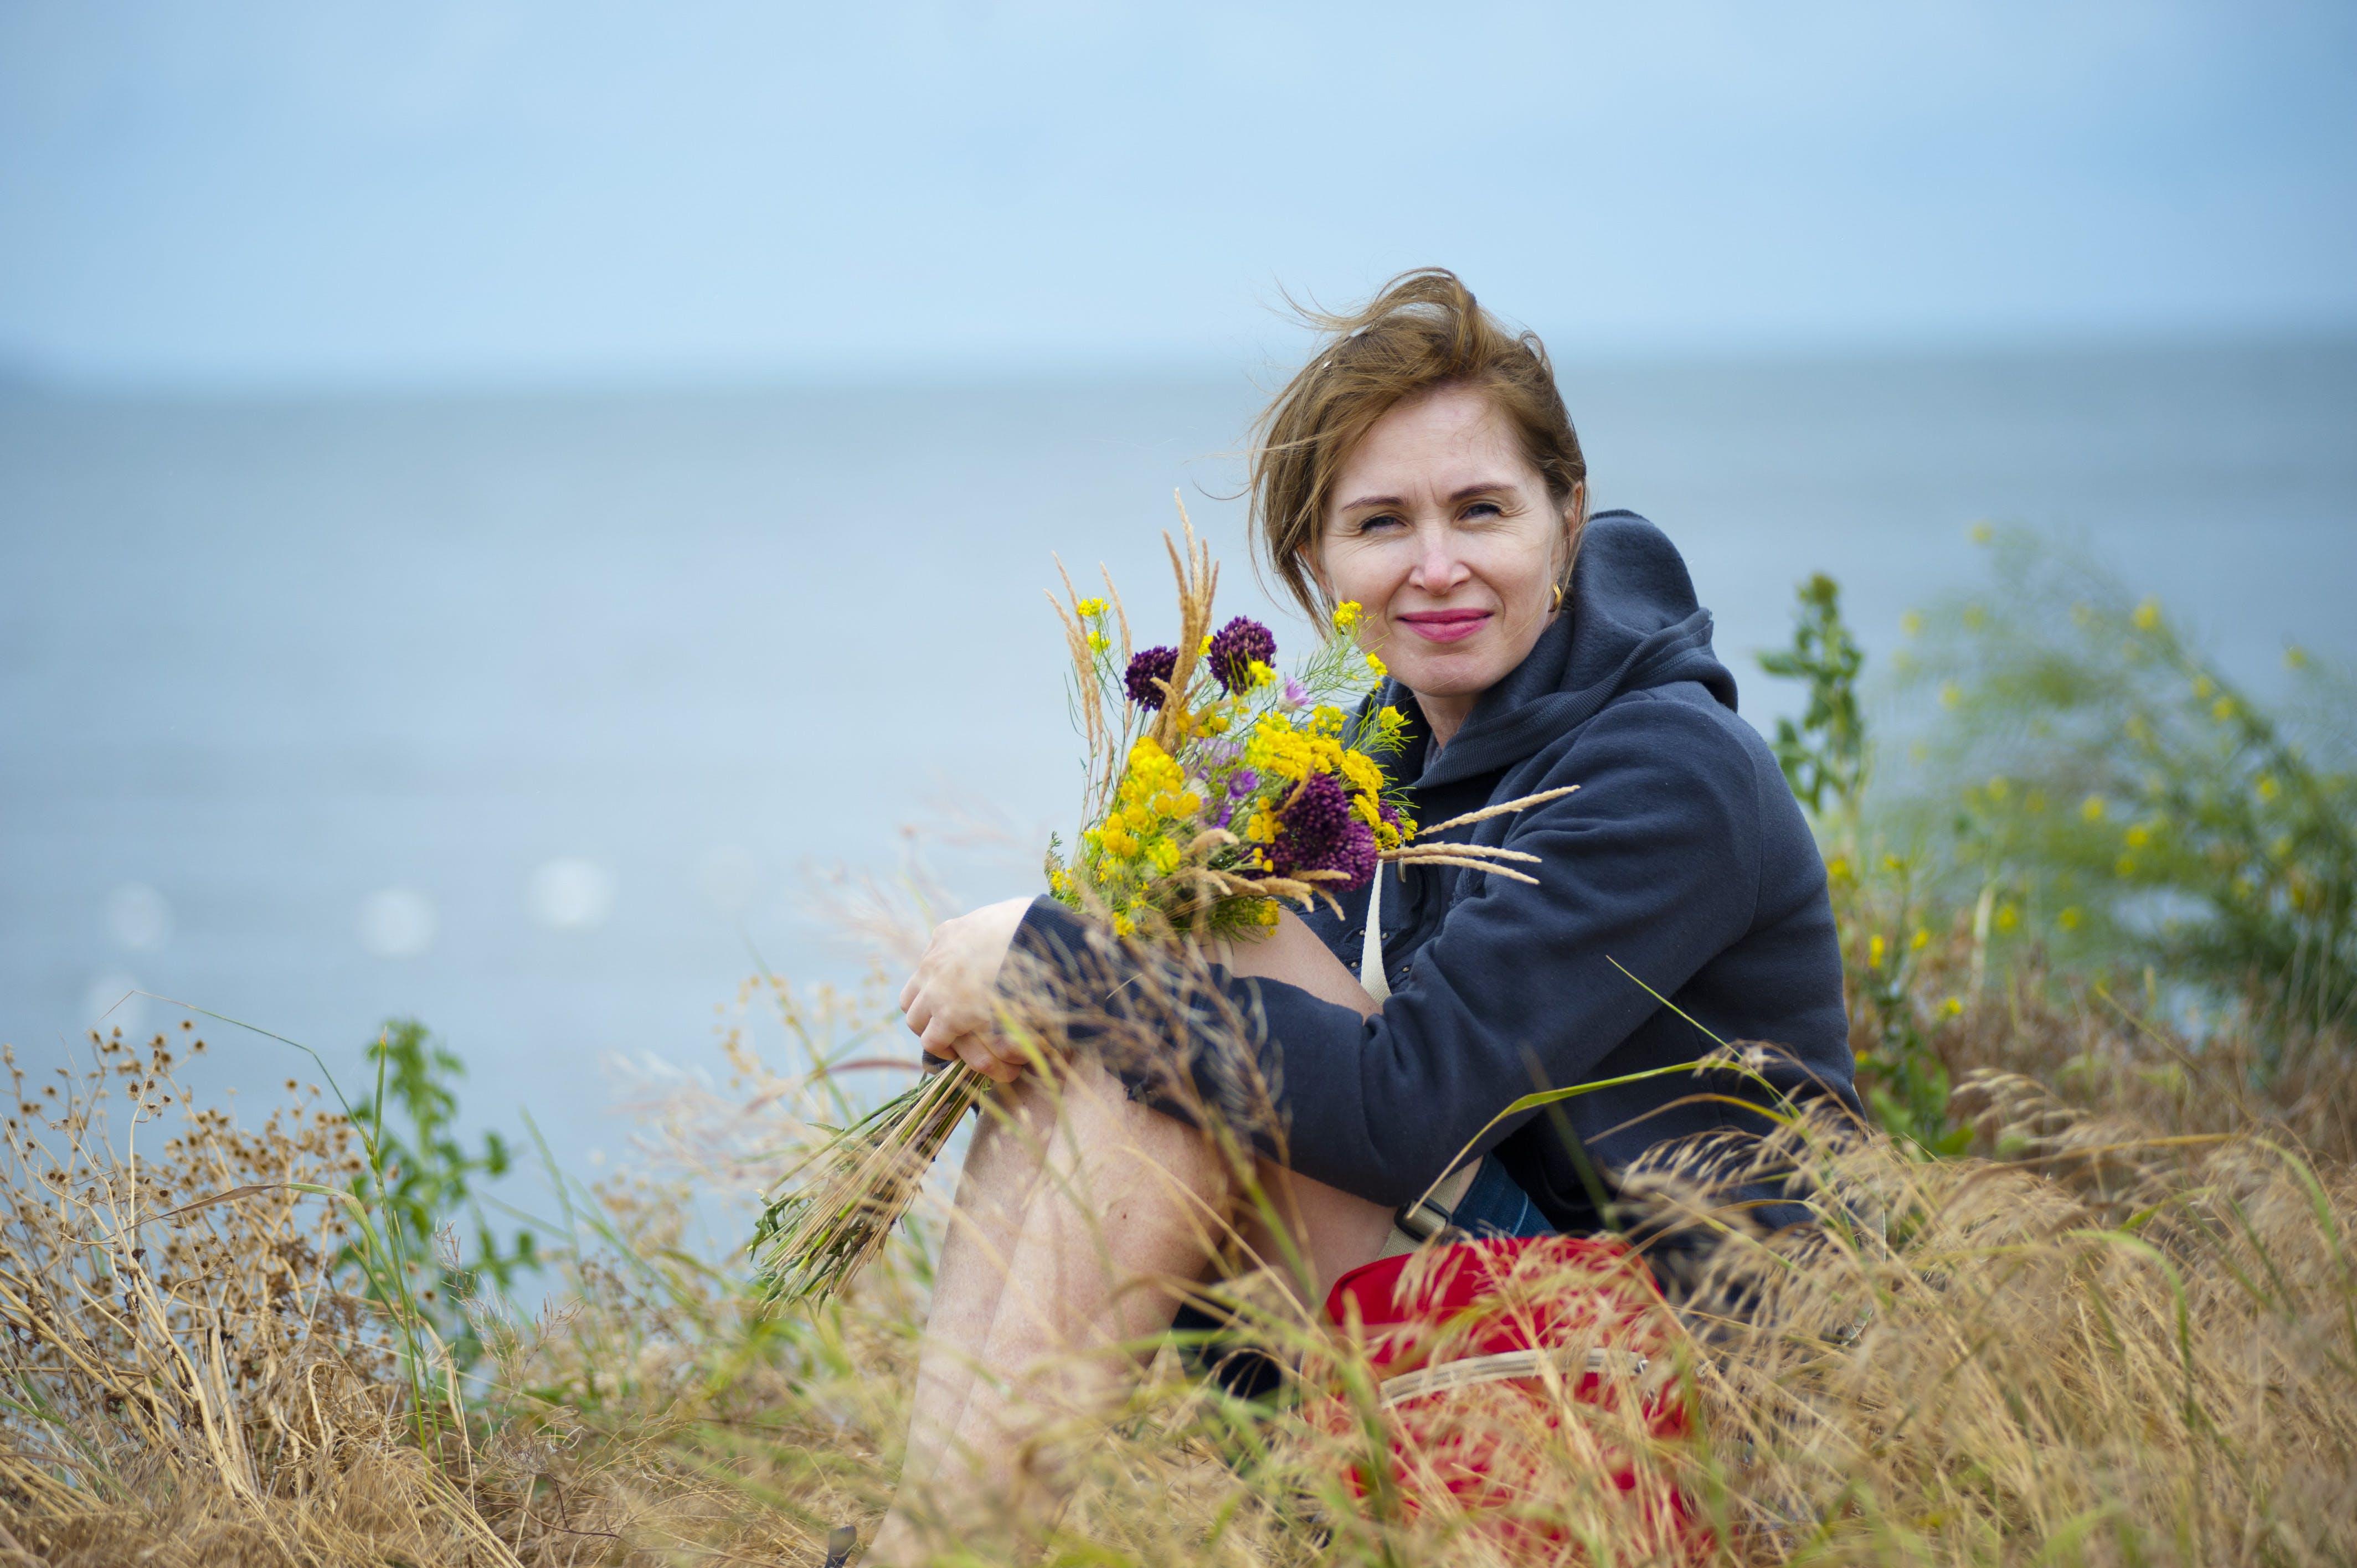 Woman Sitting on Grass Holding Flowers Wearing Black Hoodie